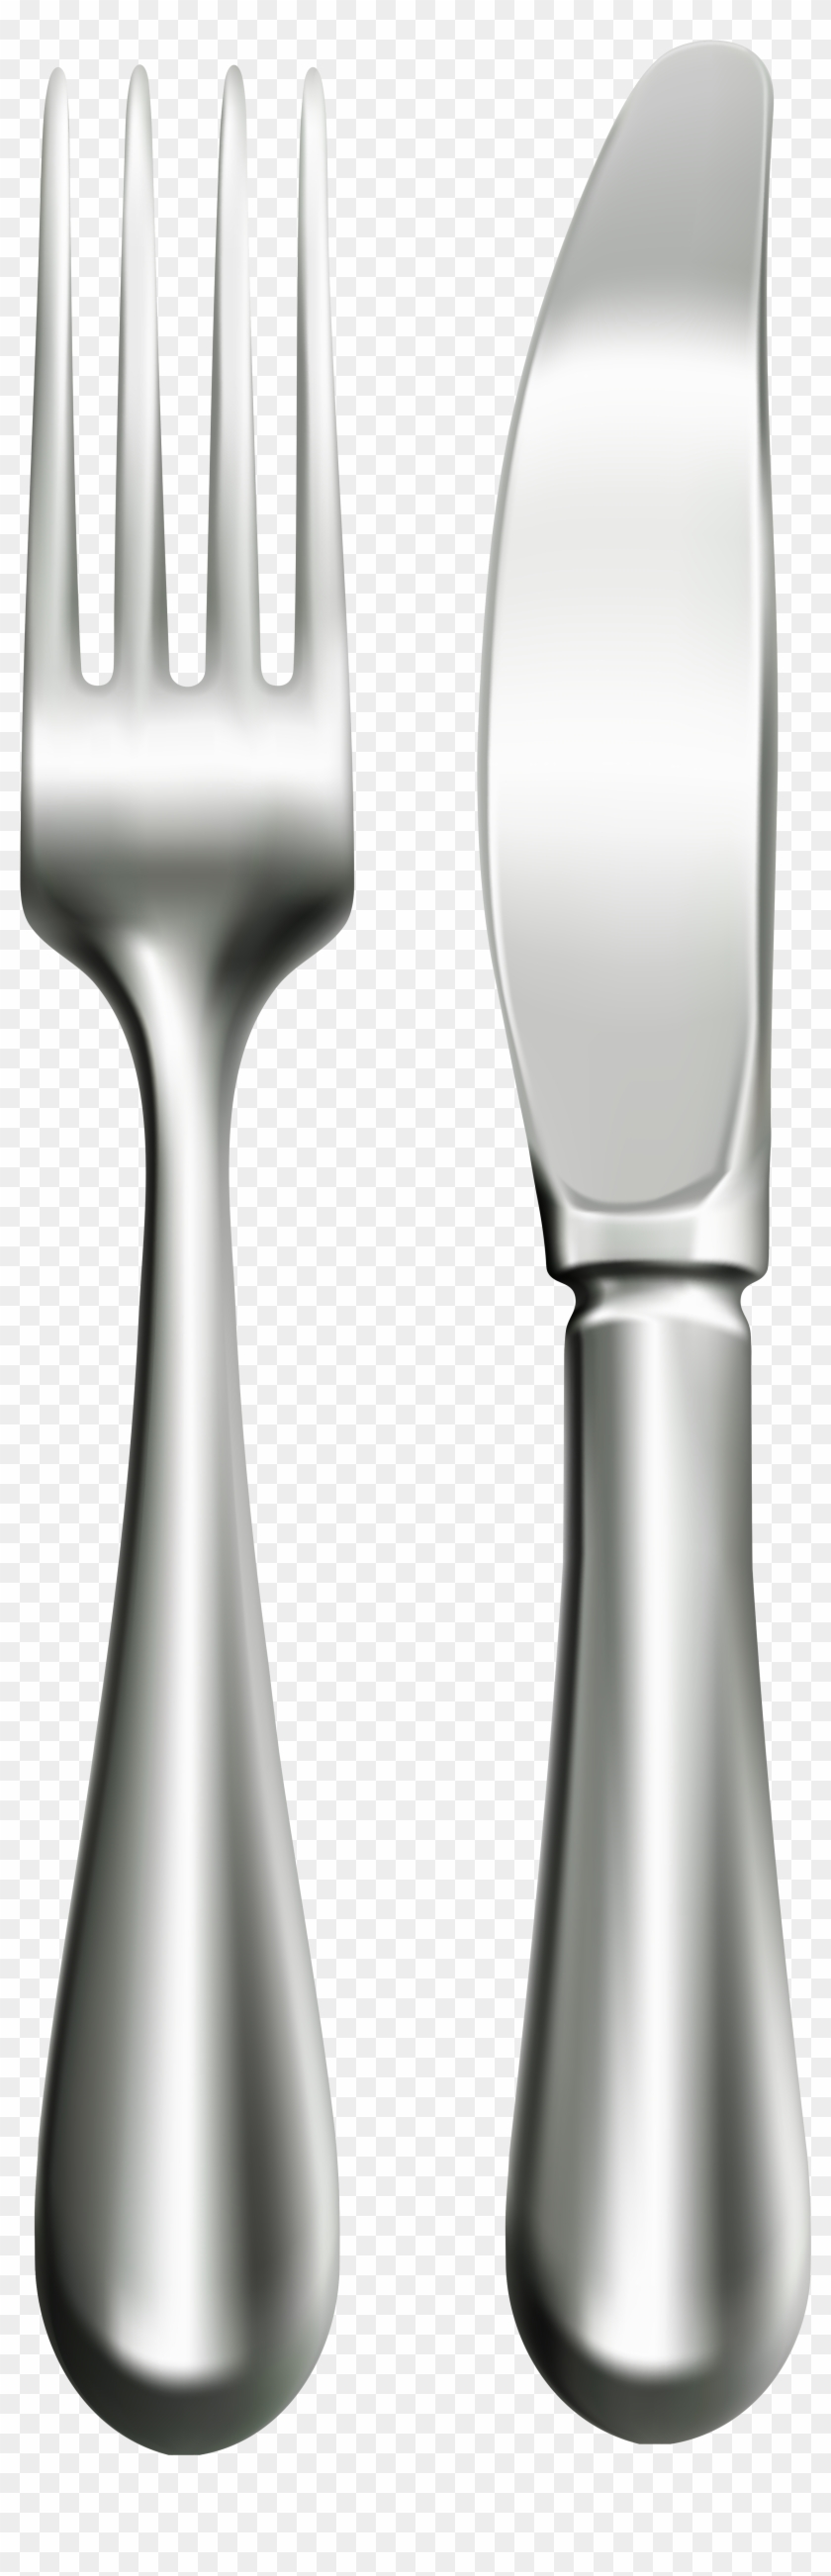 Fork And Knife Png Clip Art - Clip Art #8673